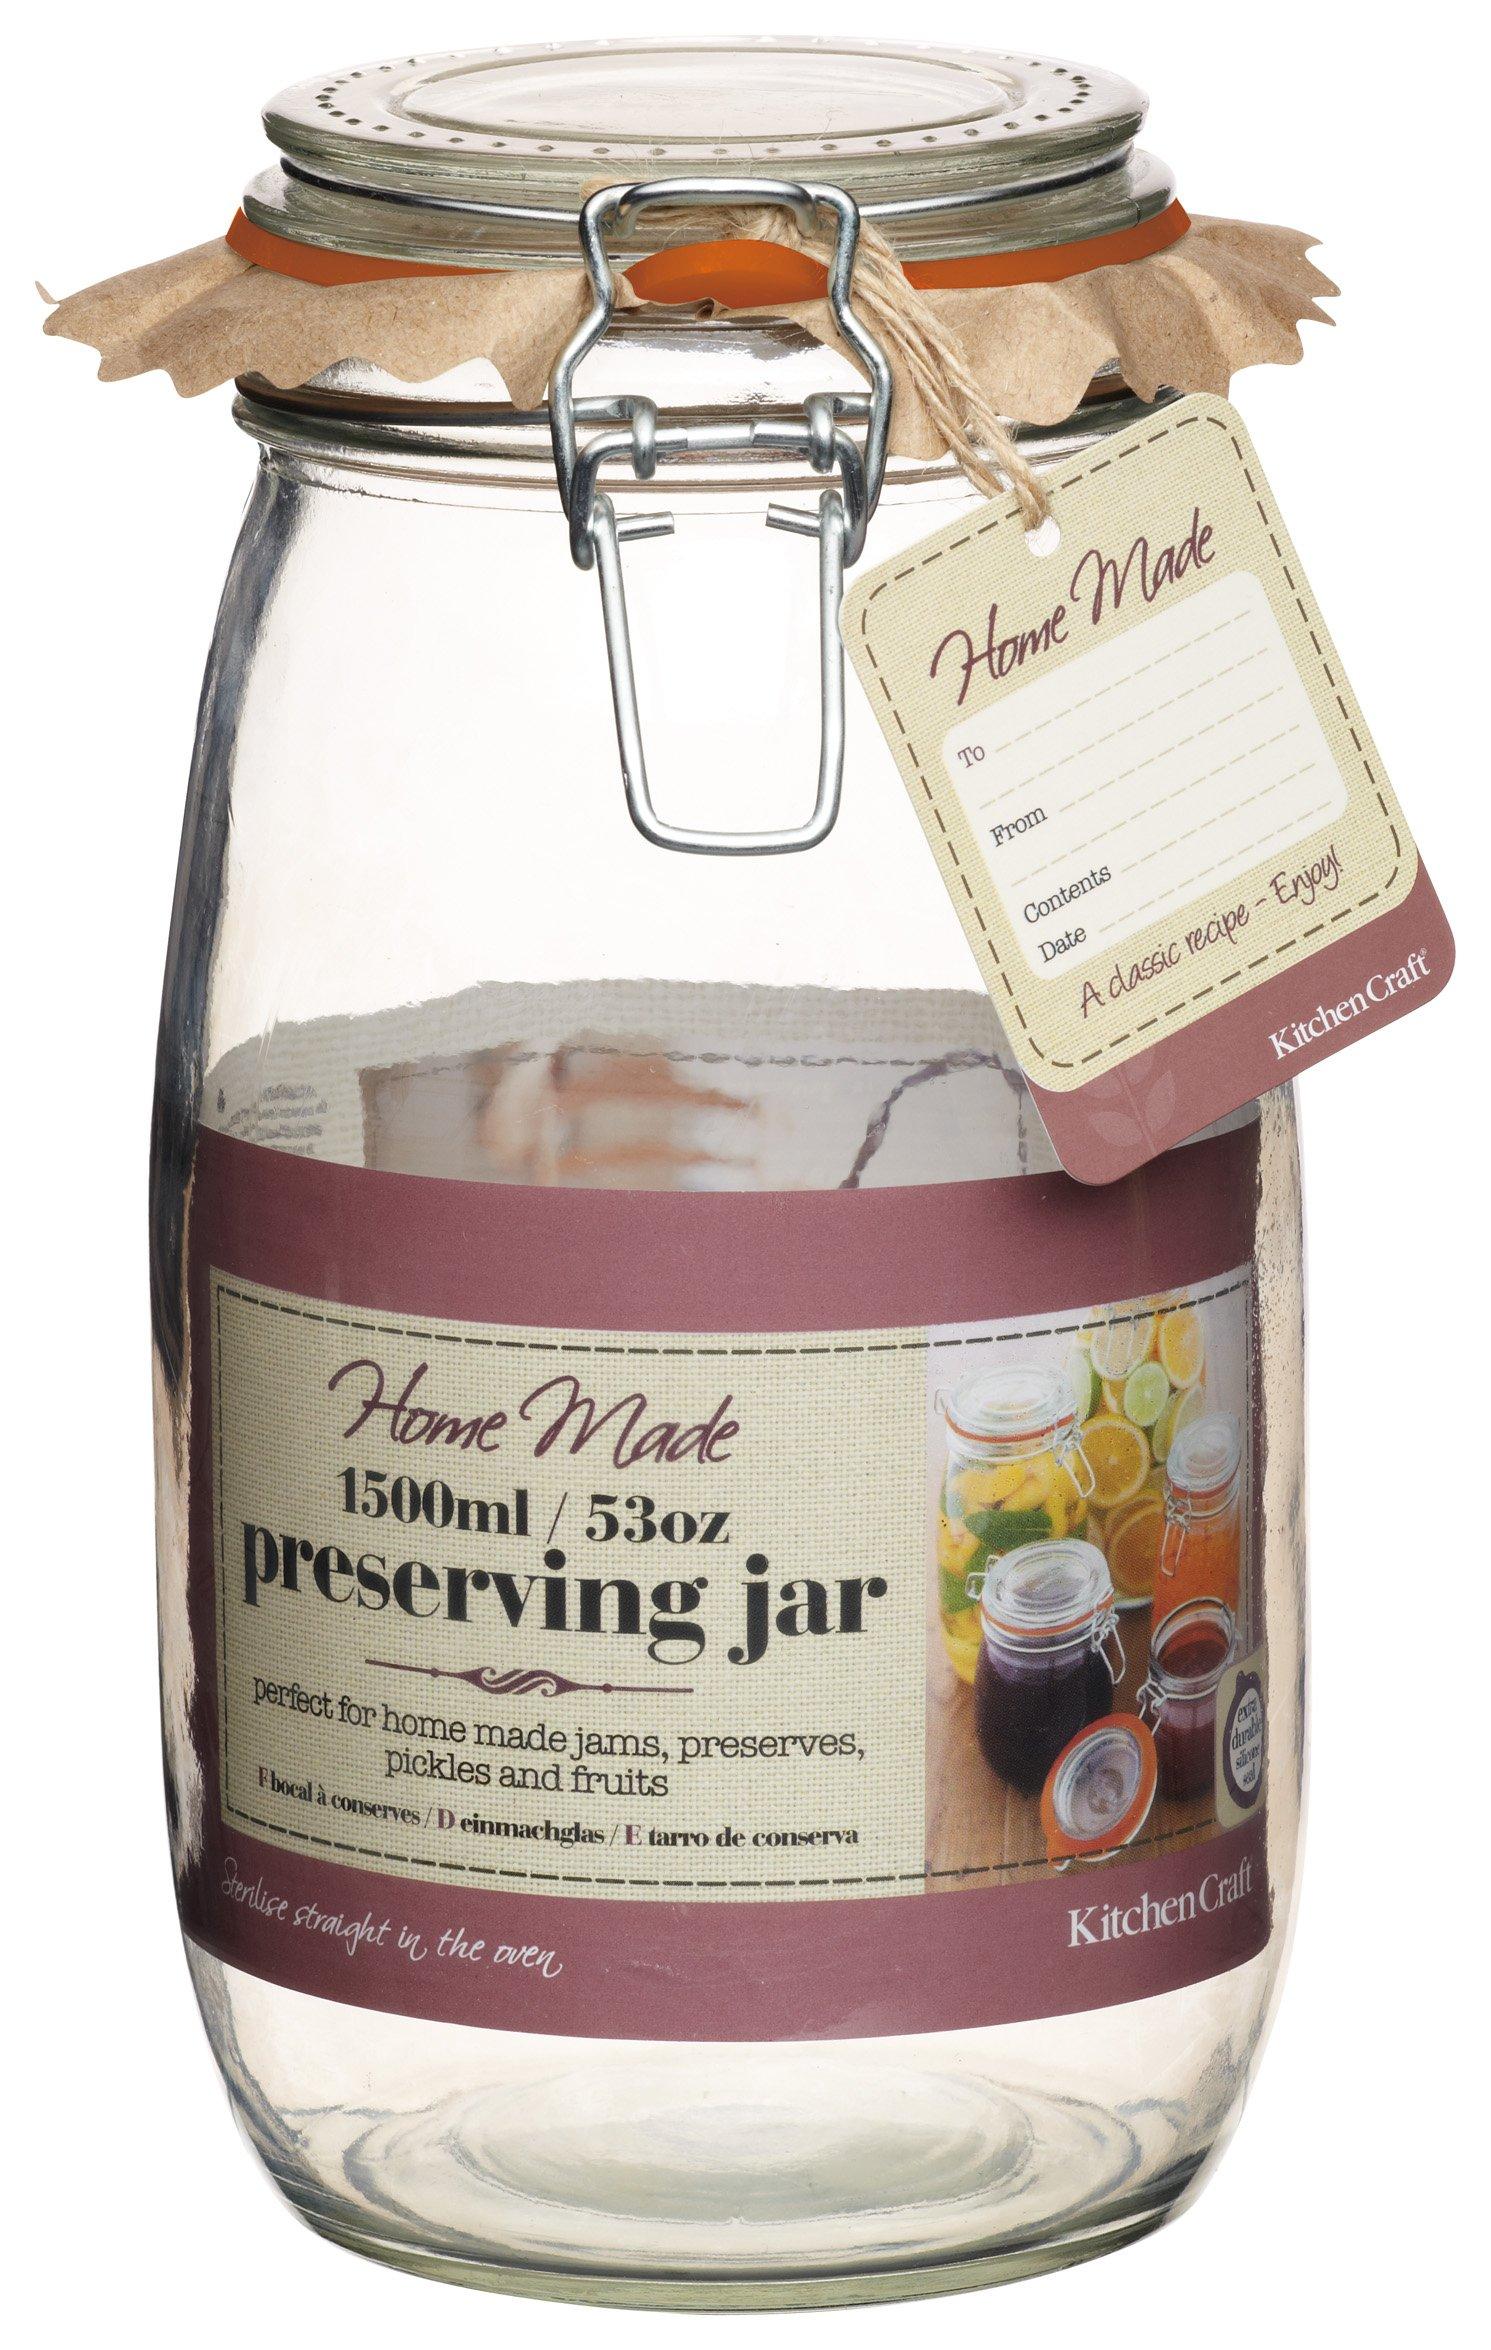 Kitchen Craft Deluxe Glass Preserving Jar, 1500 g (53 oz)